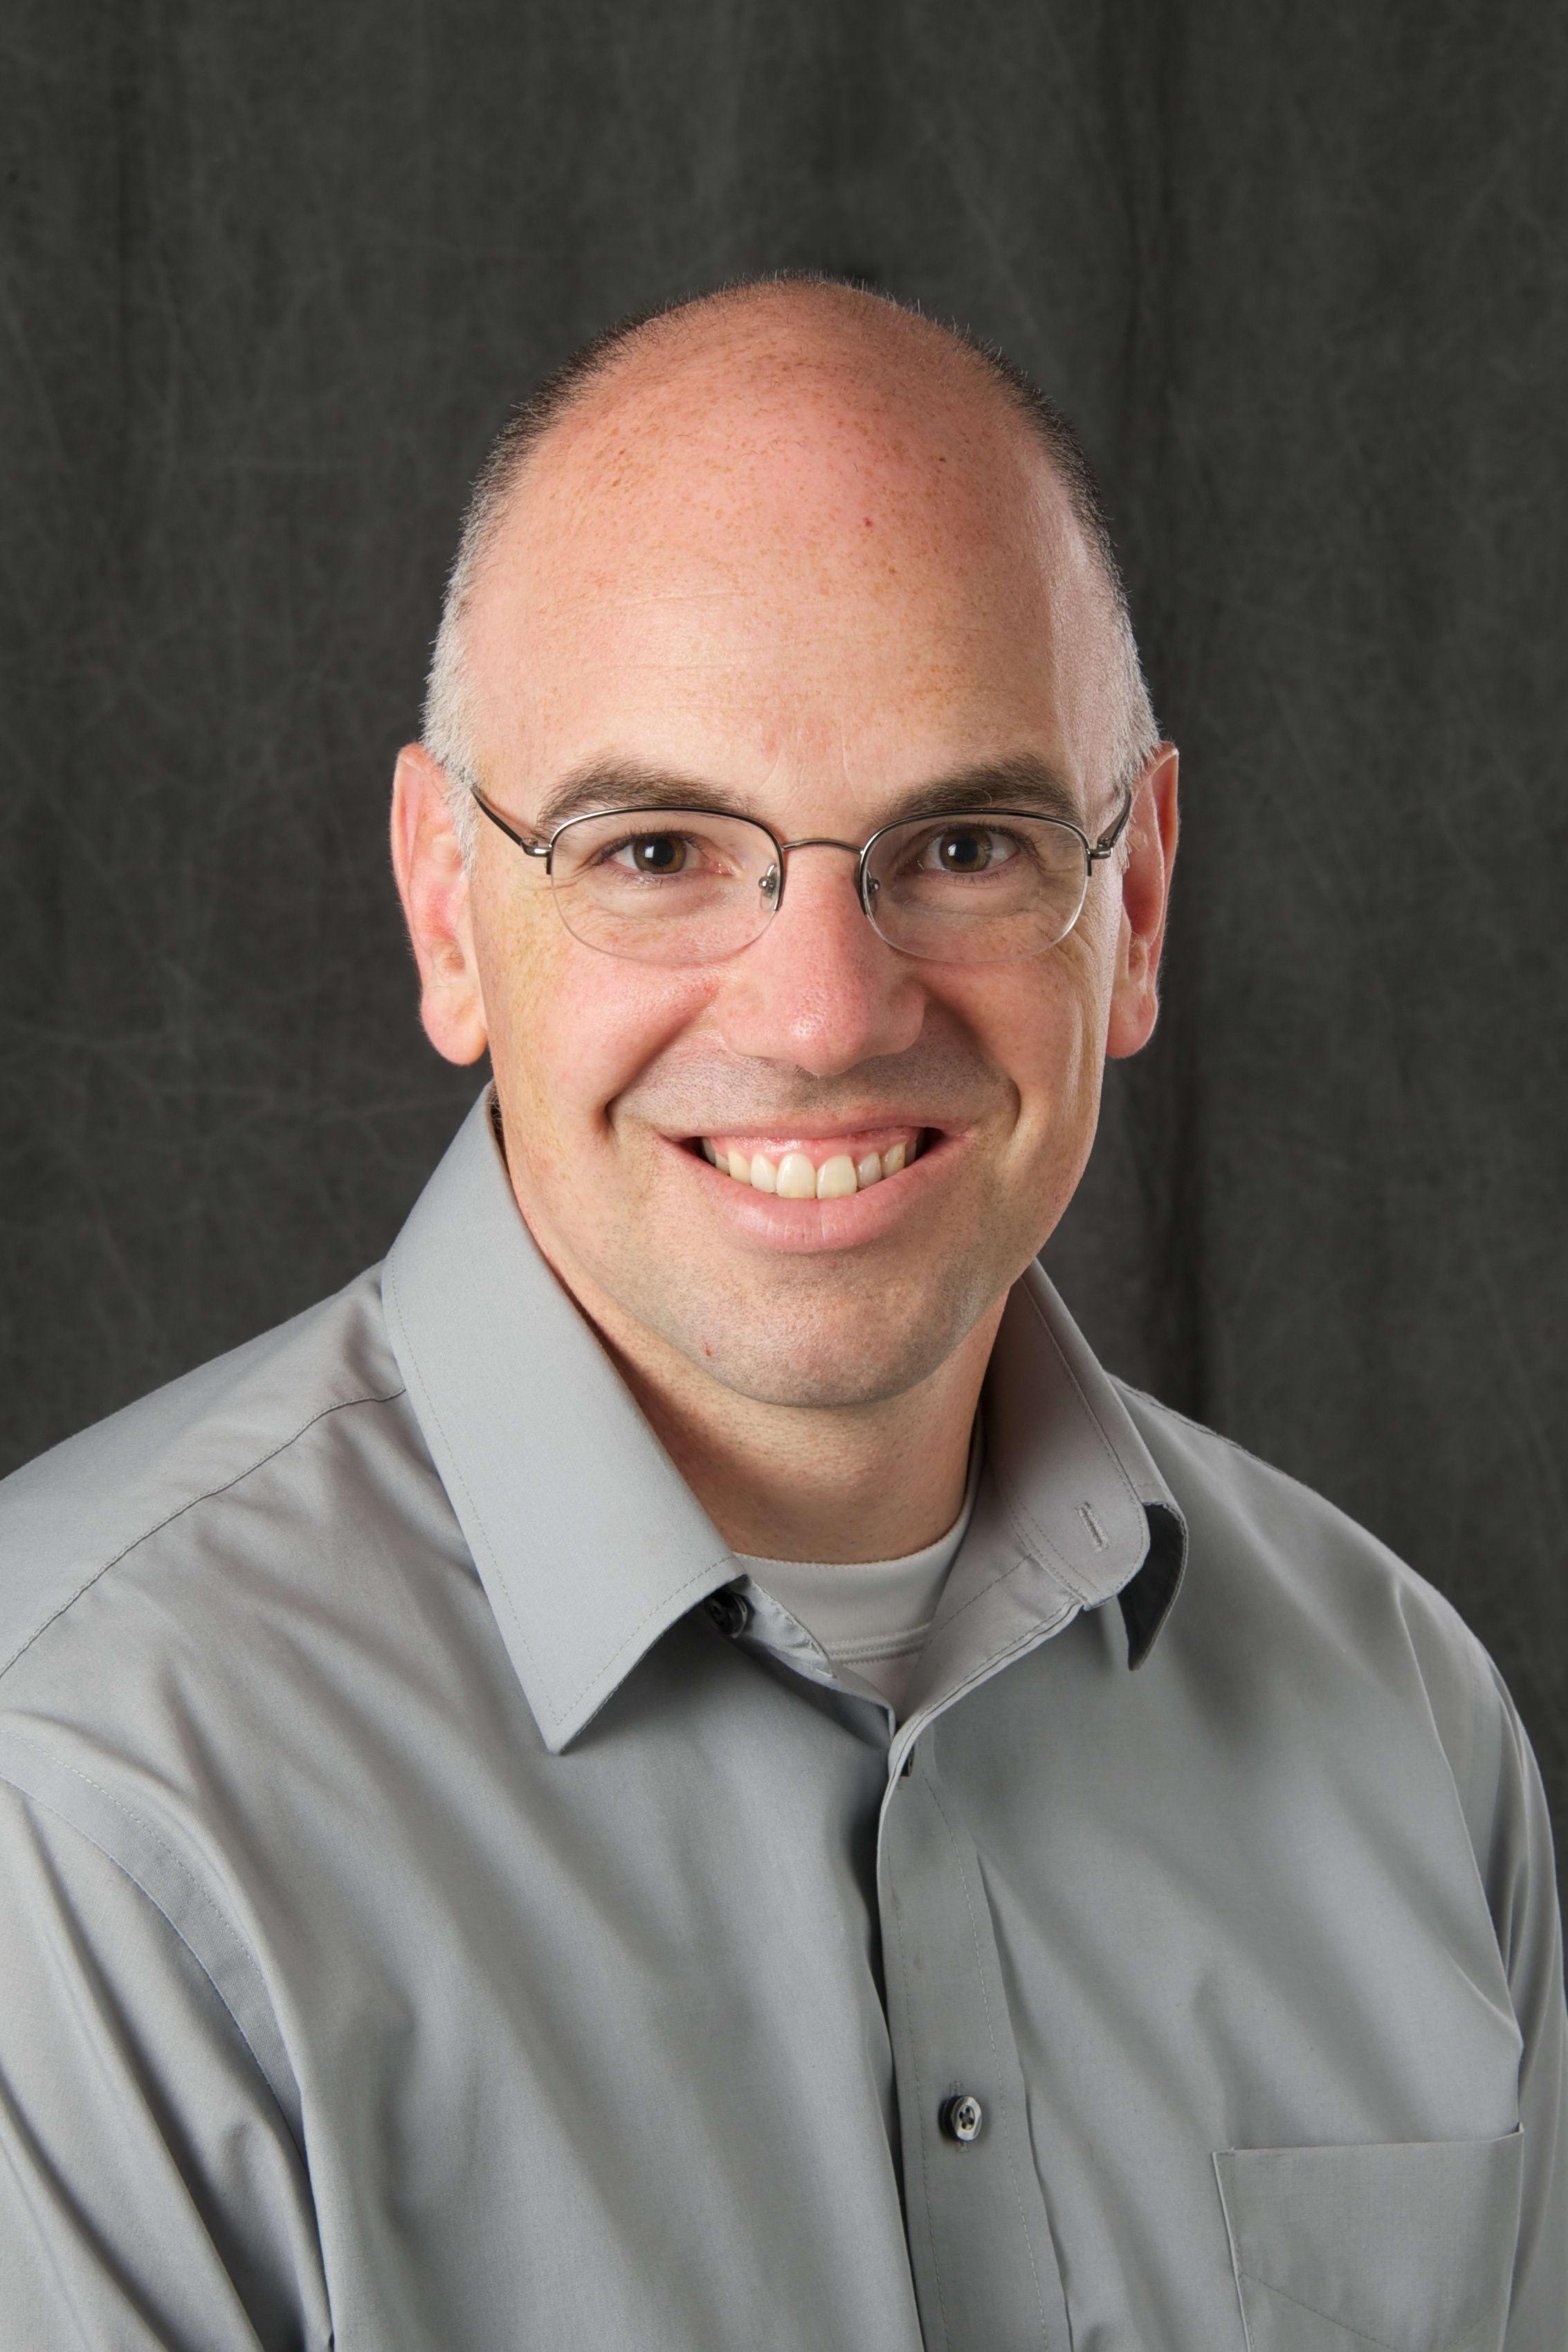 Gary J Kummet, MD Neonatal-Perinatal Medicine